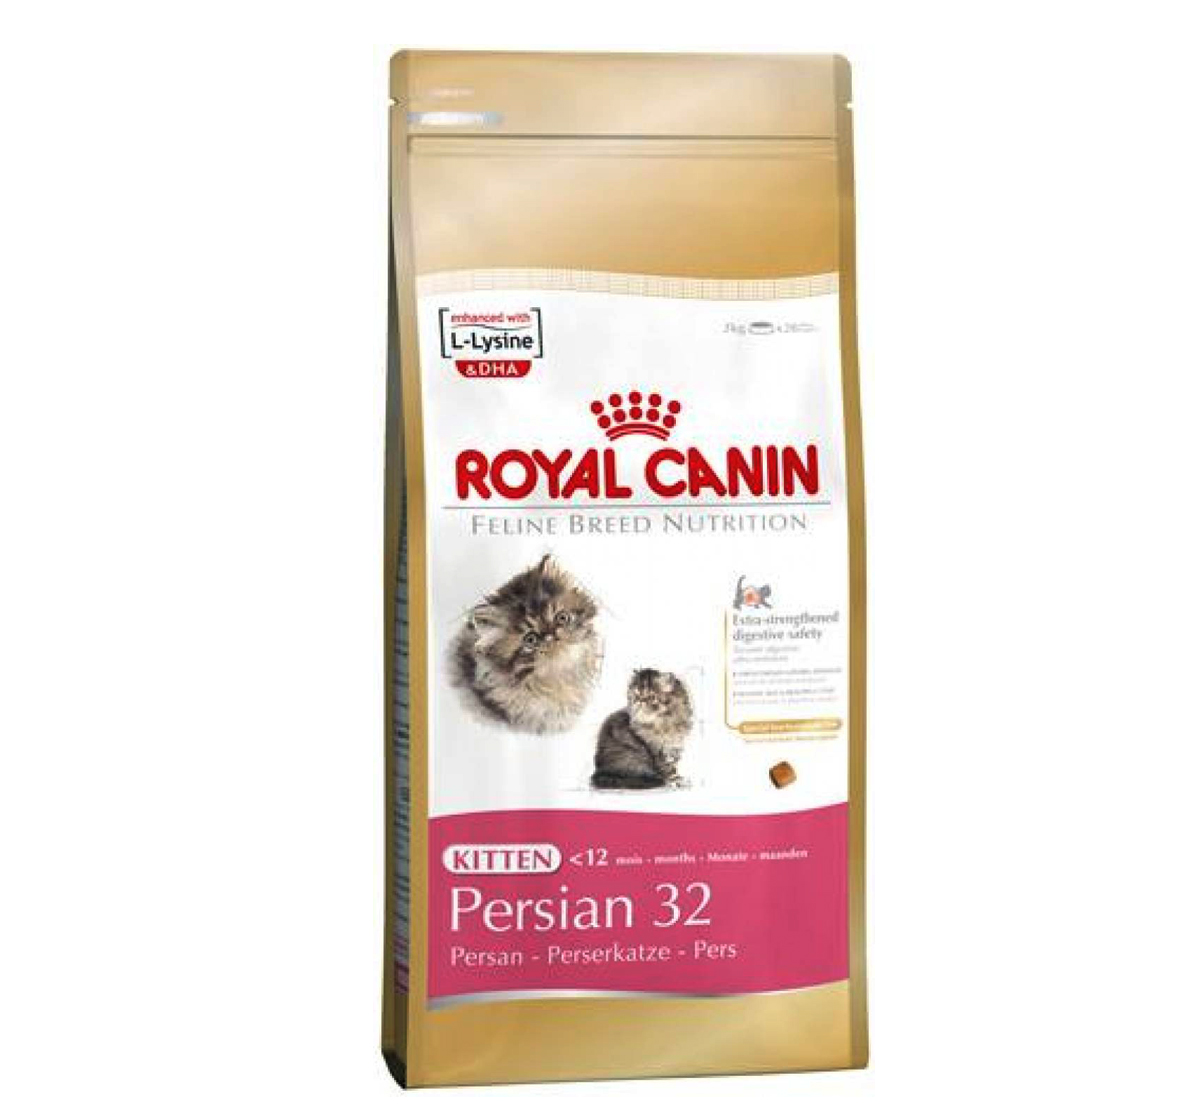 Royal Canin  Консервы  Корм лечебный  Корма  Для кошек